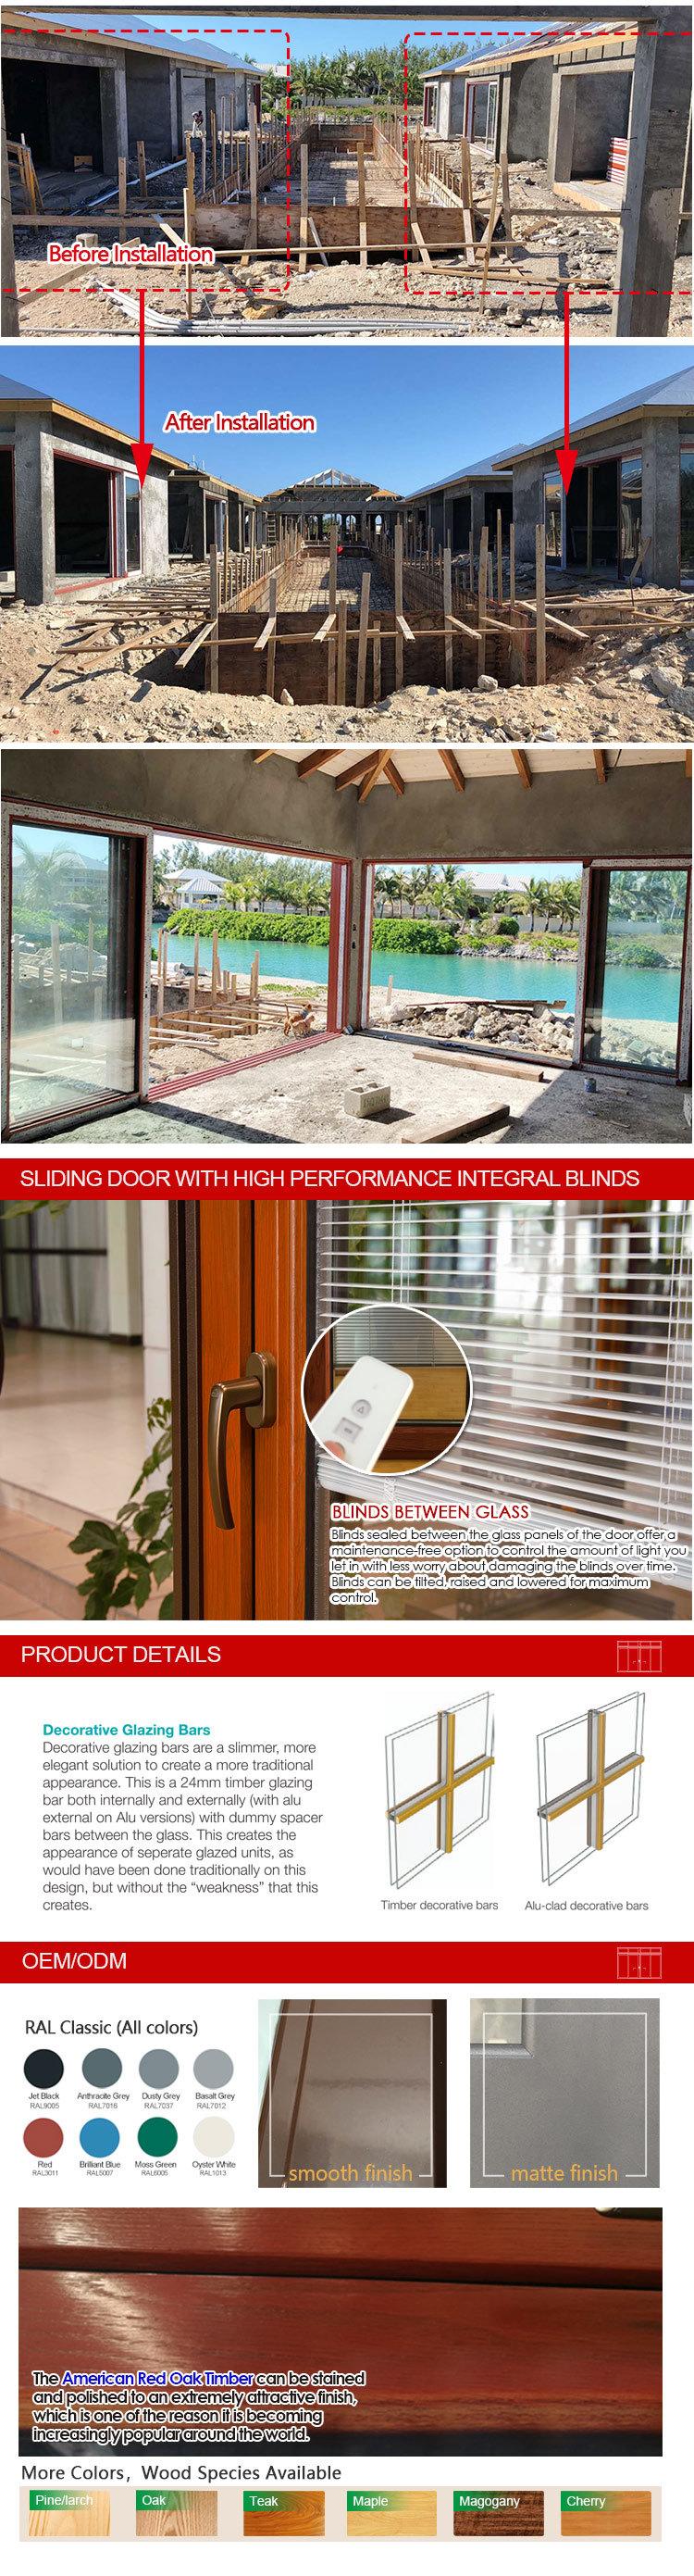 Customized Size Aluminum Clad Solid Wood Gliding Window, Aluminum Wood Sliding Frame Window by Wooden Aluminium Window Company